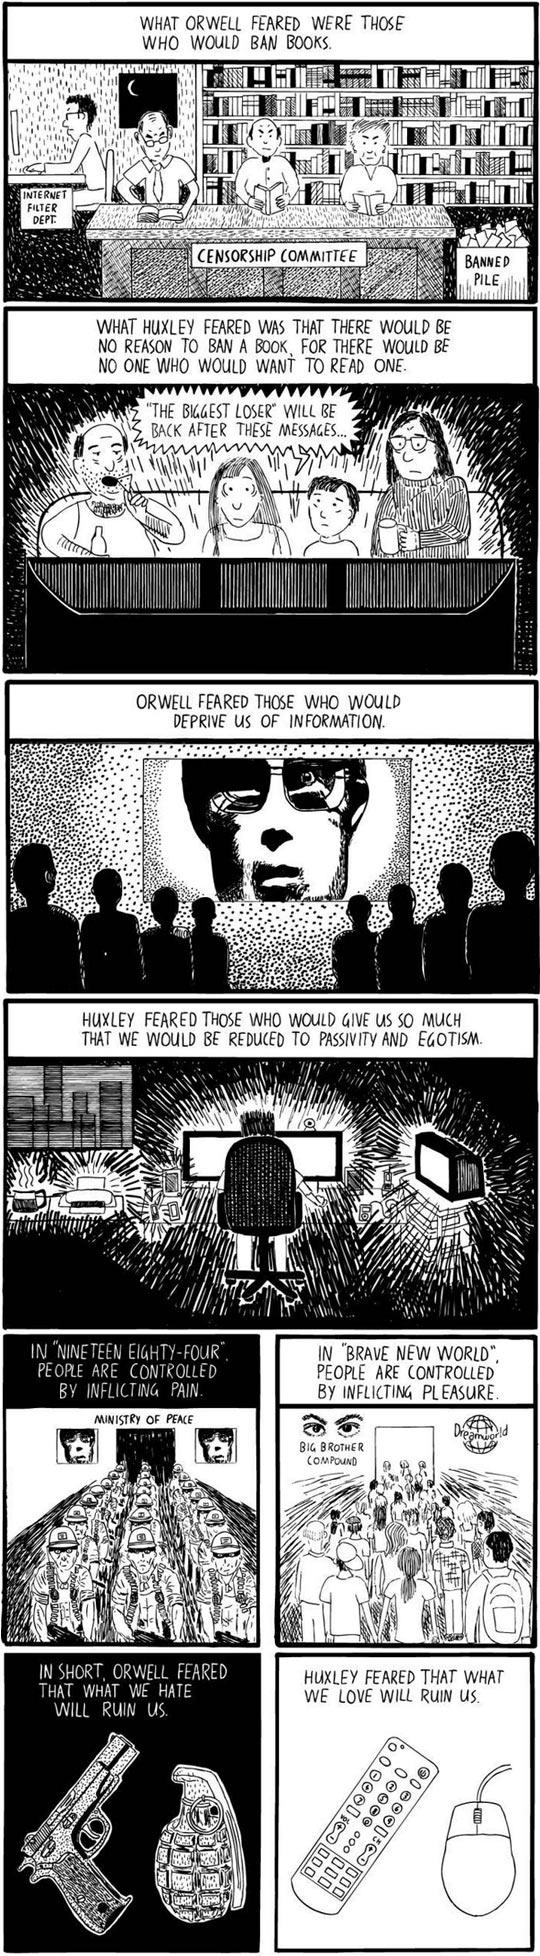 cool-Huxley-Orwell-comic-explained